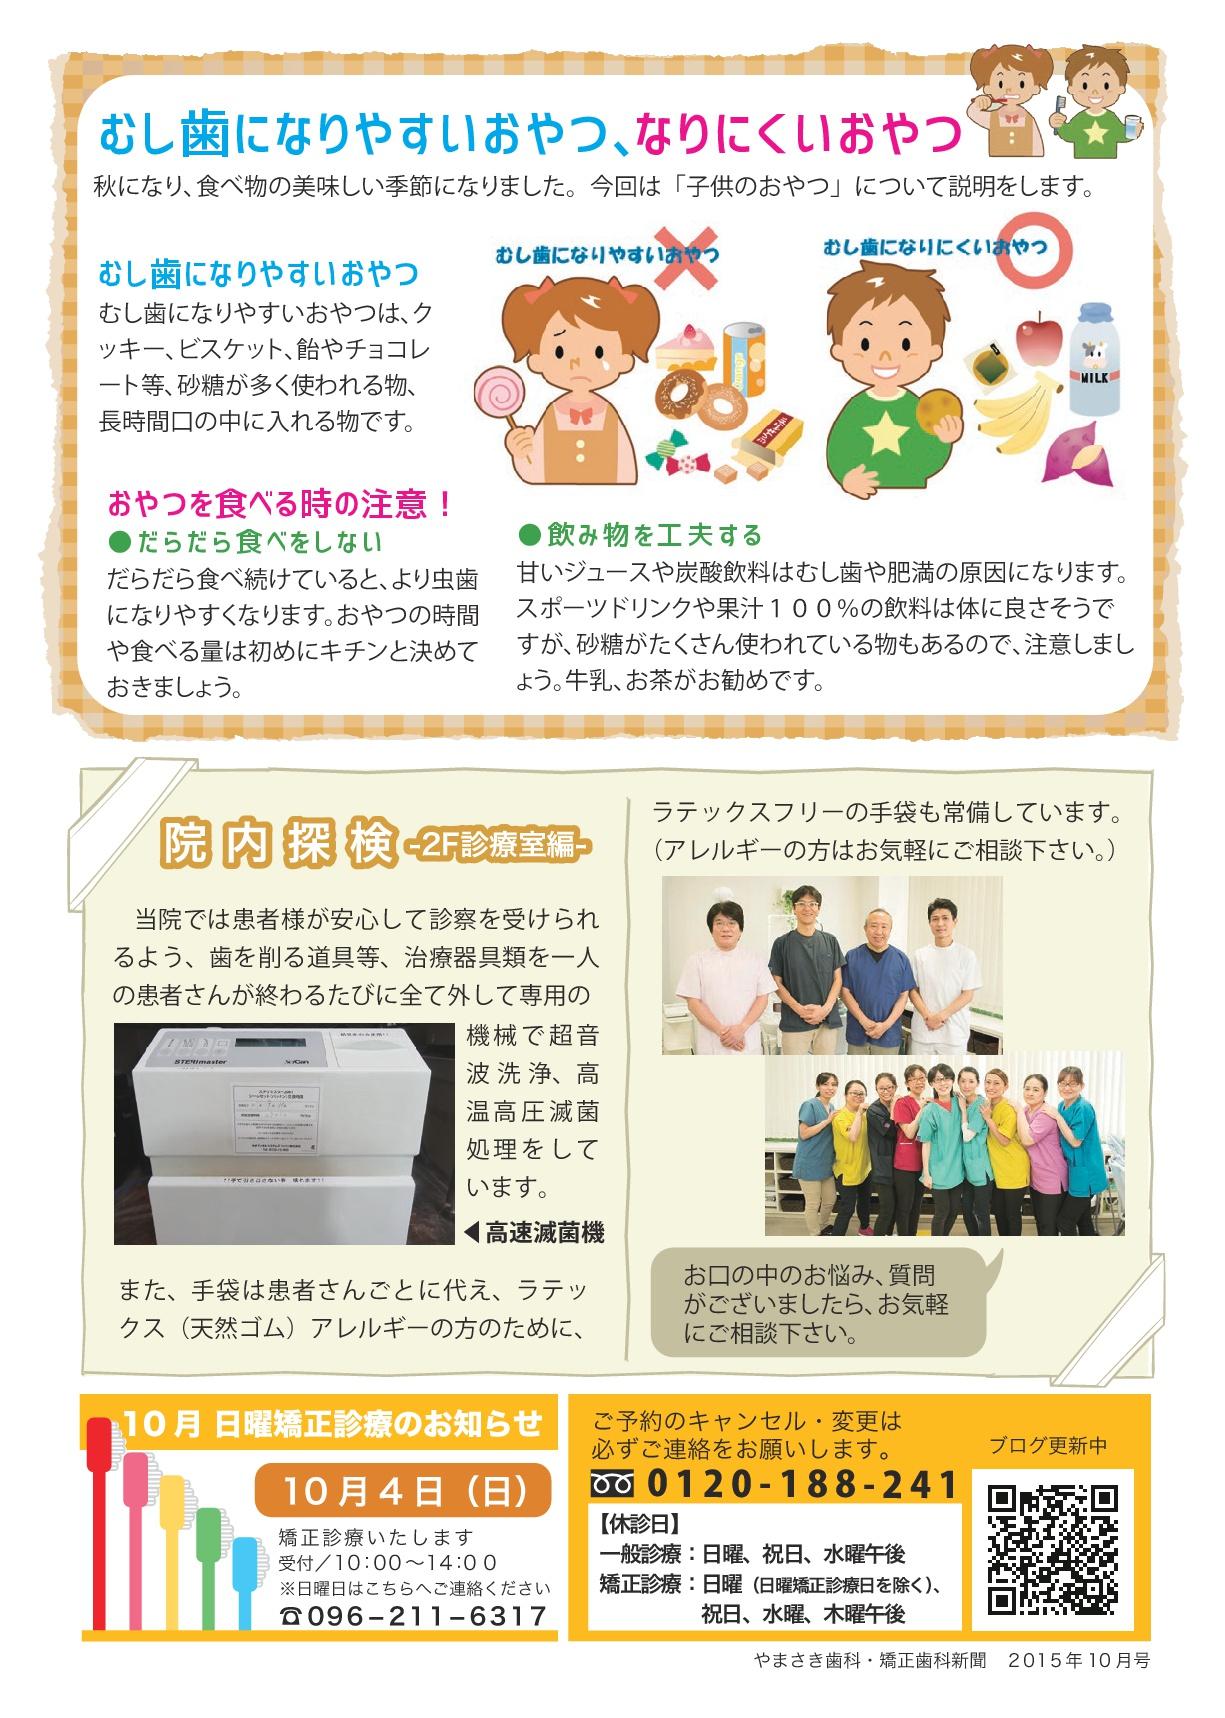 sinbun15-10-2-001